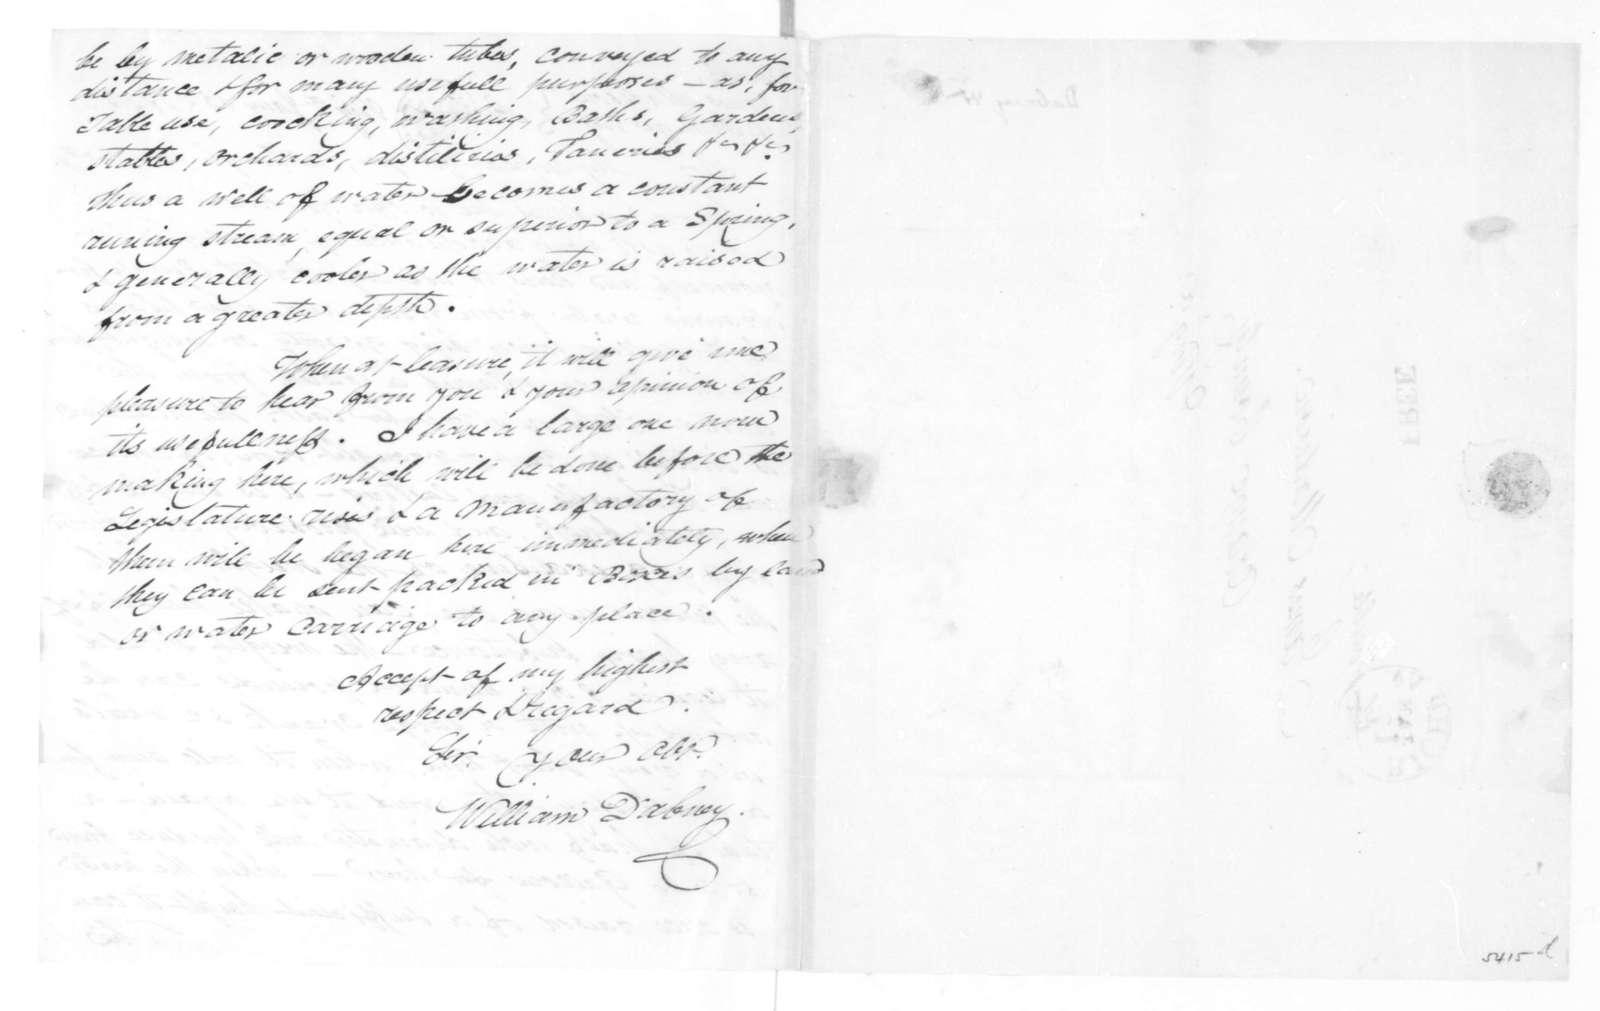 William Dabney to James Madison, January 15, 1825.